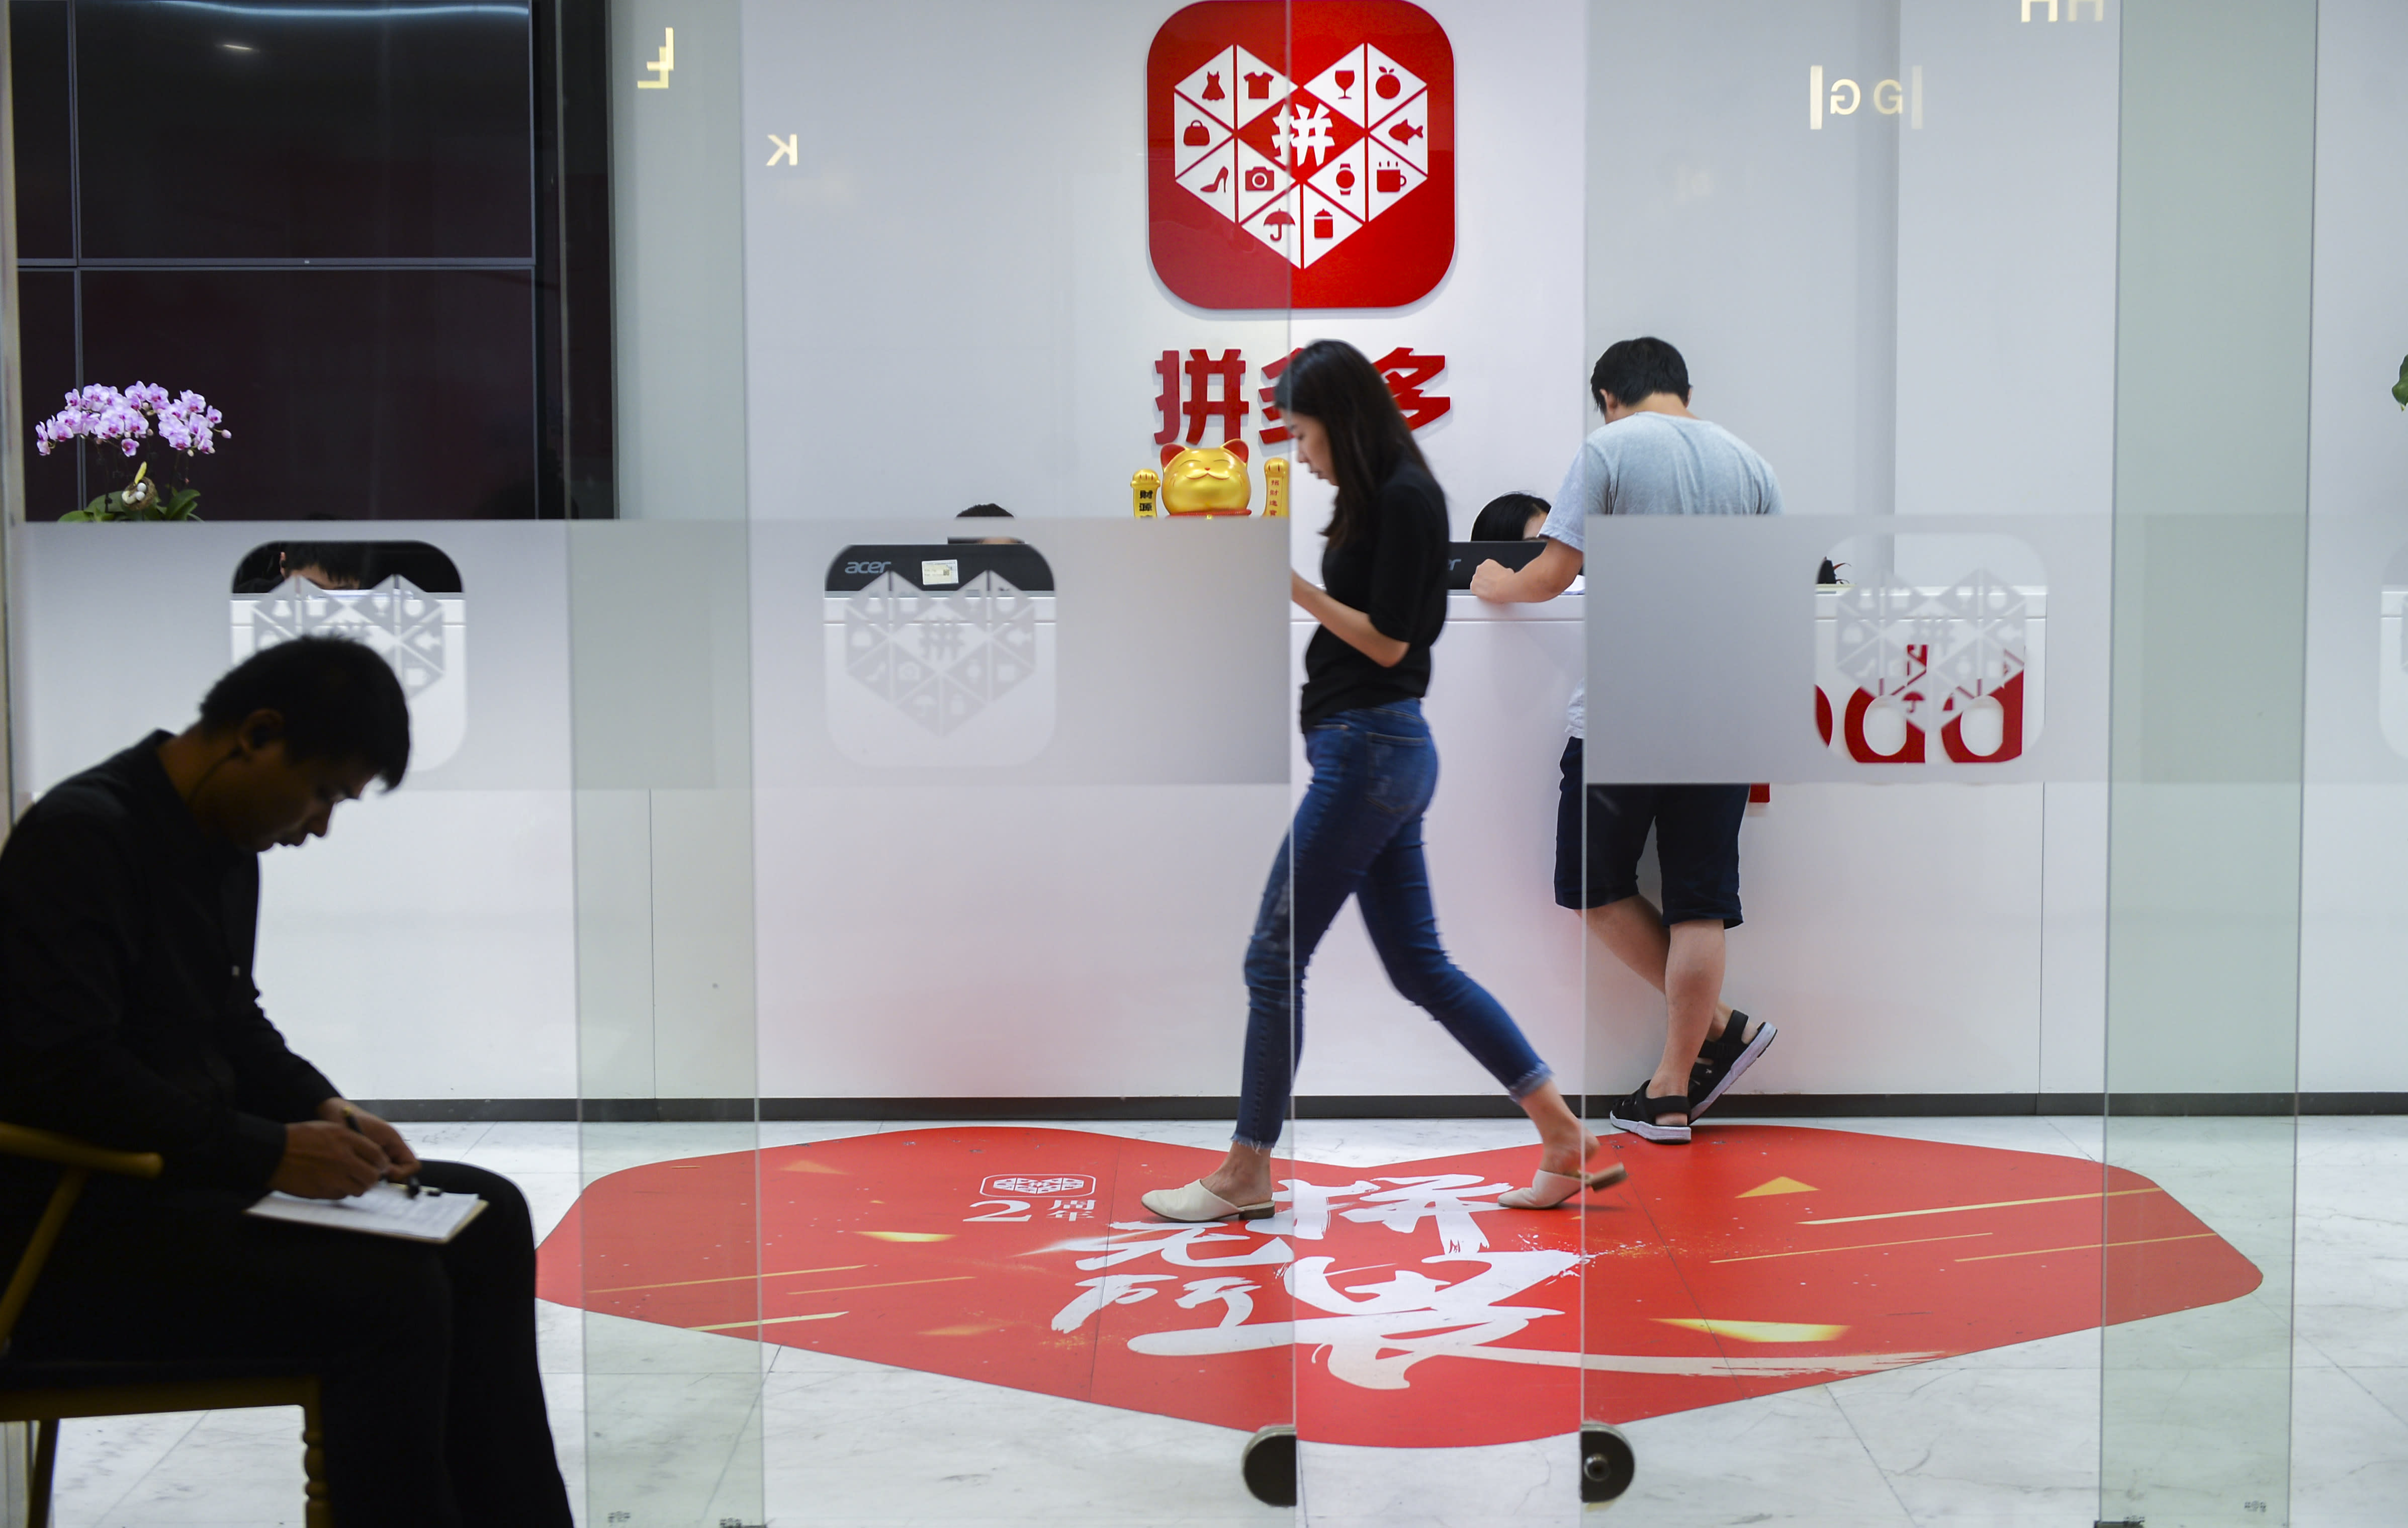 China's Pinduoduo raises $1.1 billion in private share placement